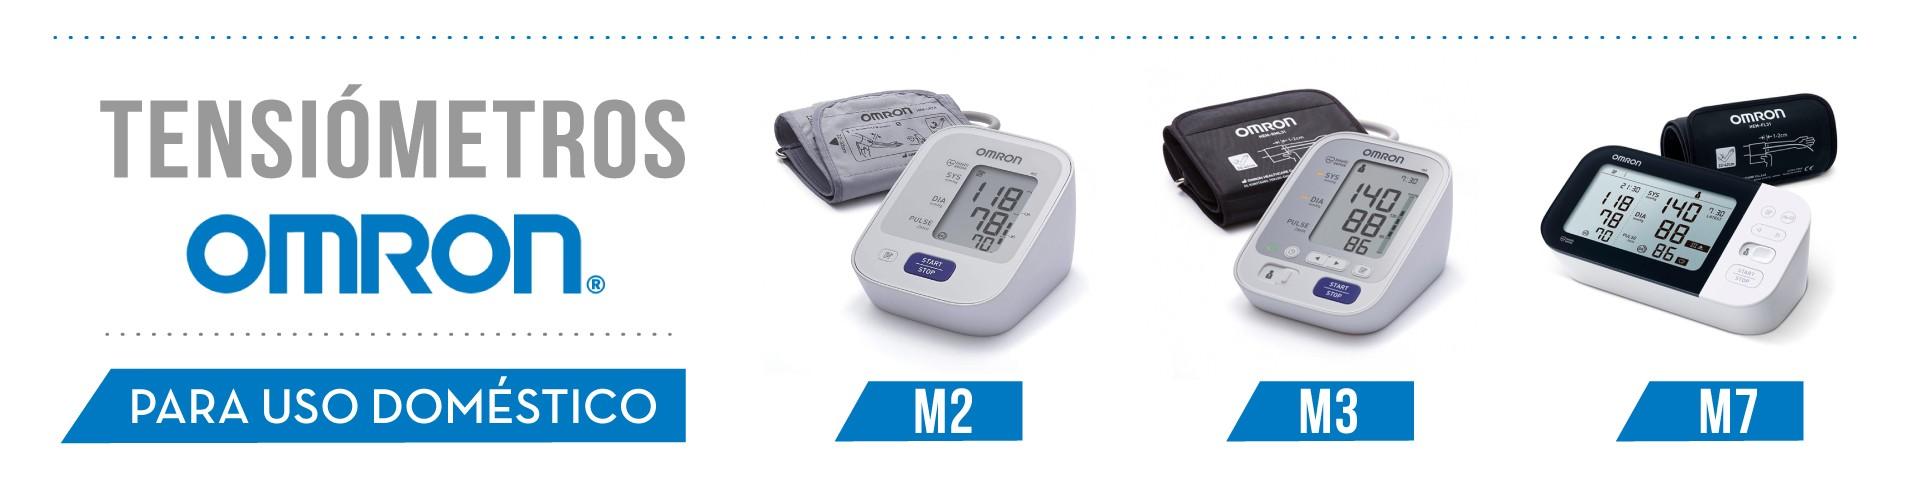 Tensiometros para uso domestico